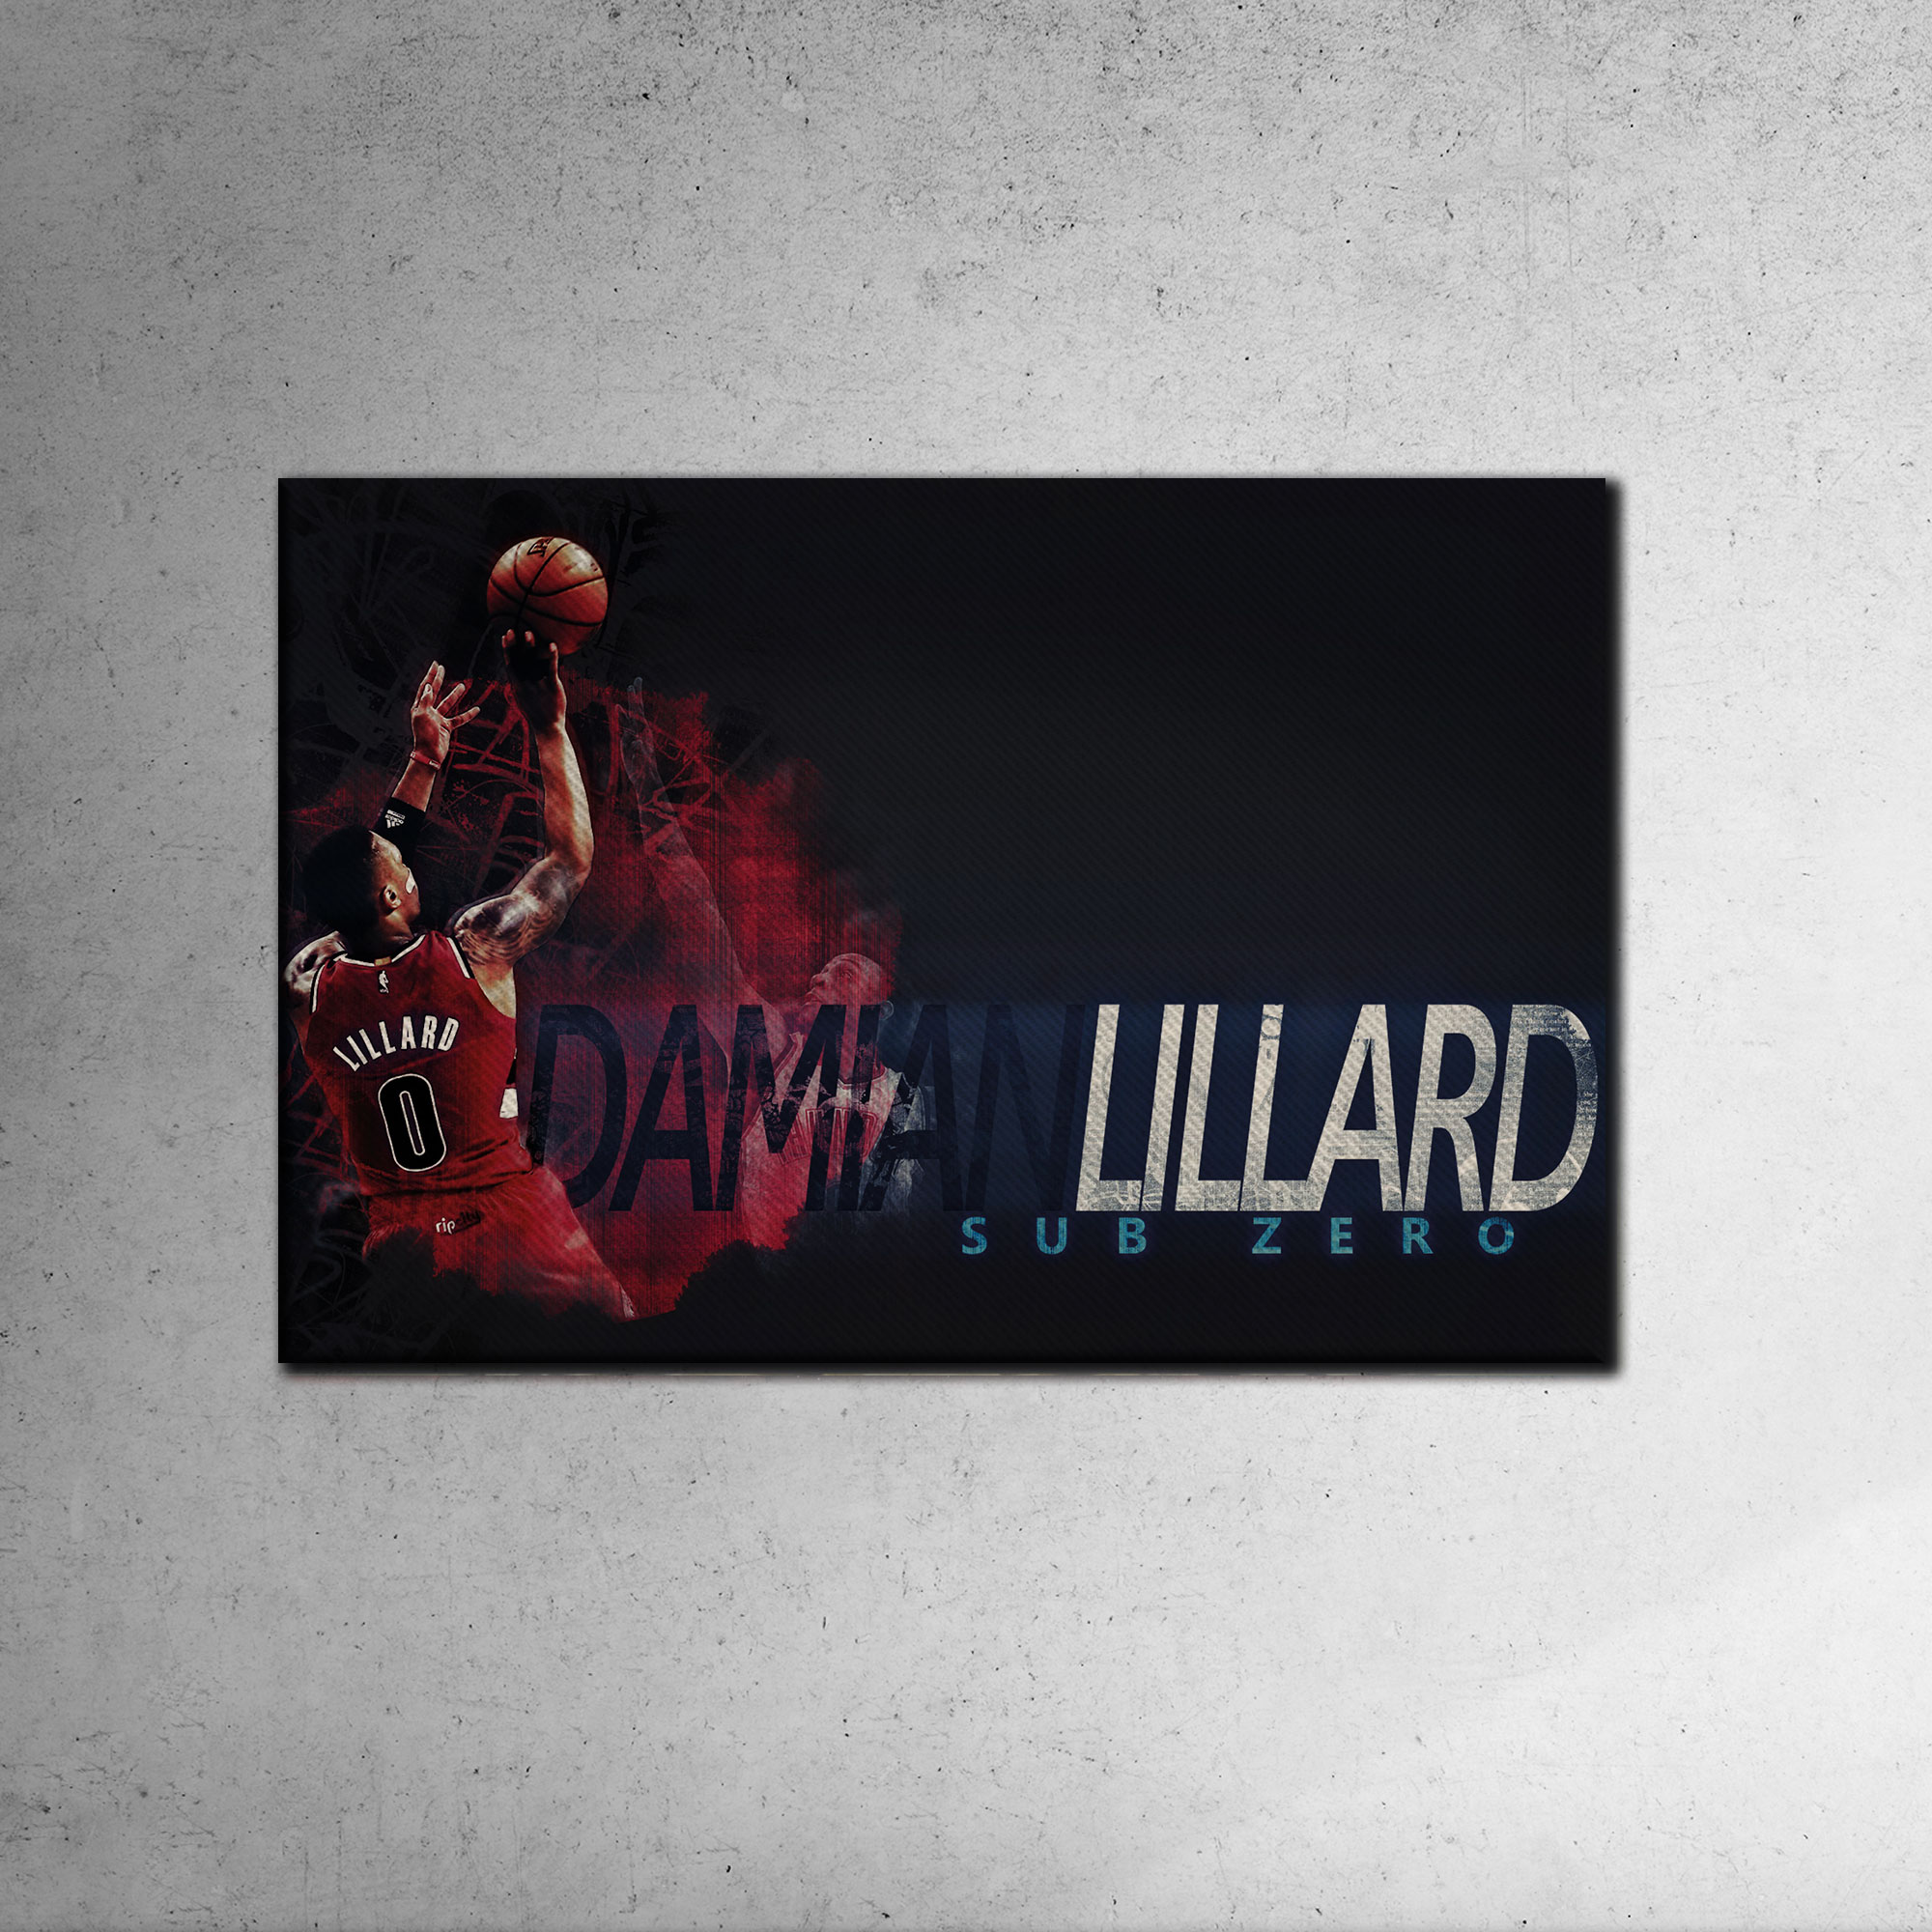 Damian Lillard Canvas Tablo (Nba-canvas-damian1)